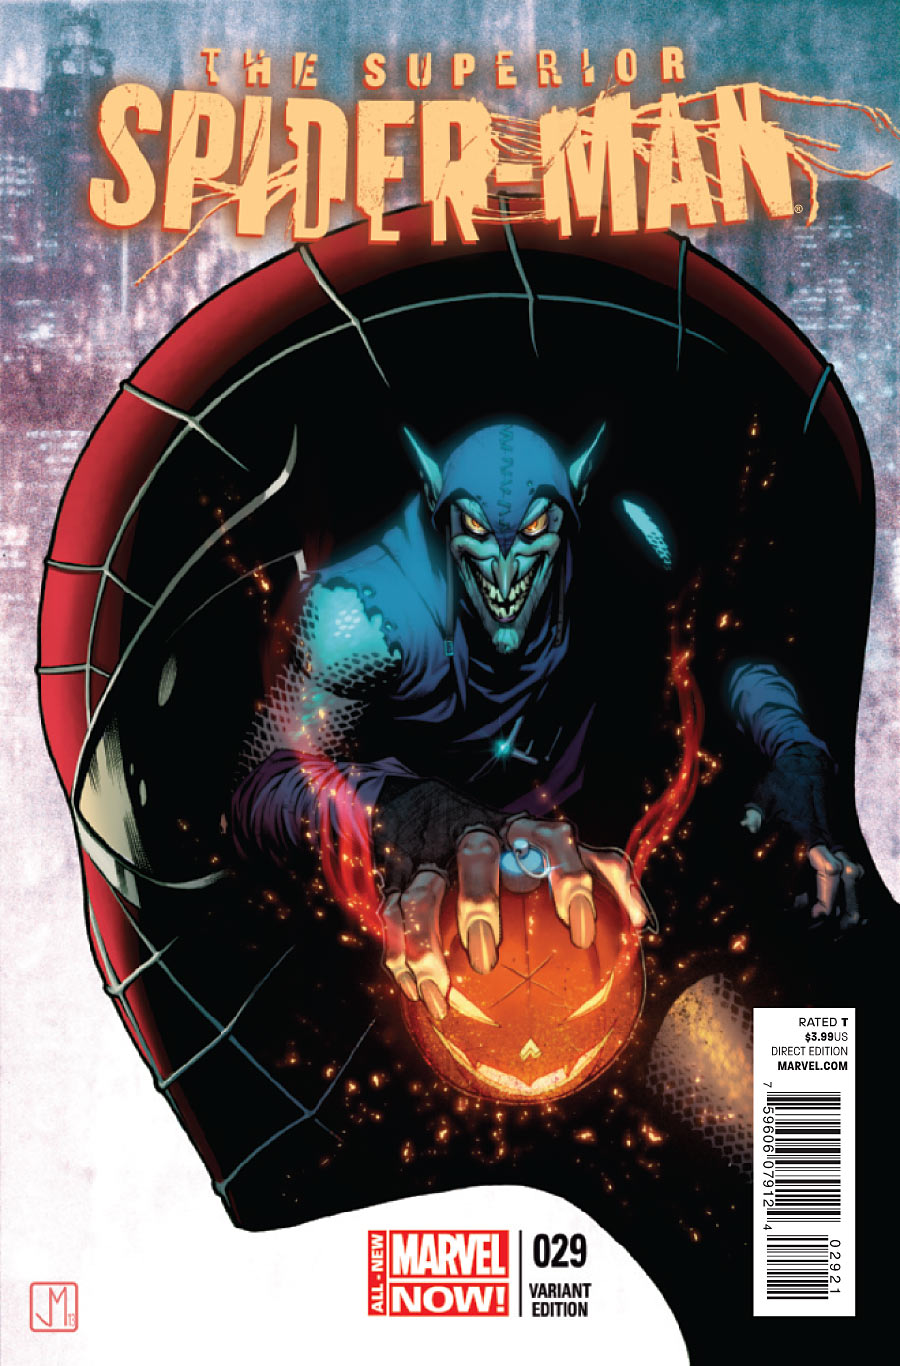 SuperiorSpider-Man#29-VariantCover